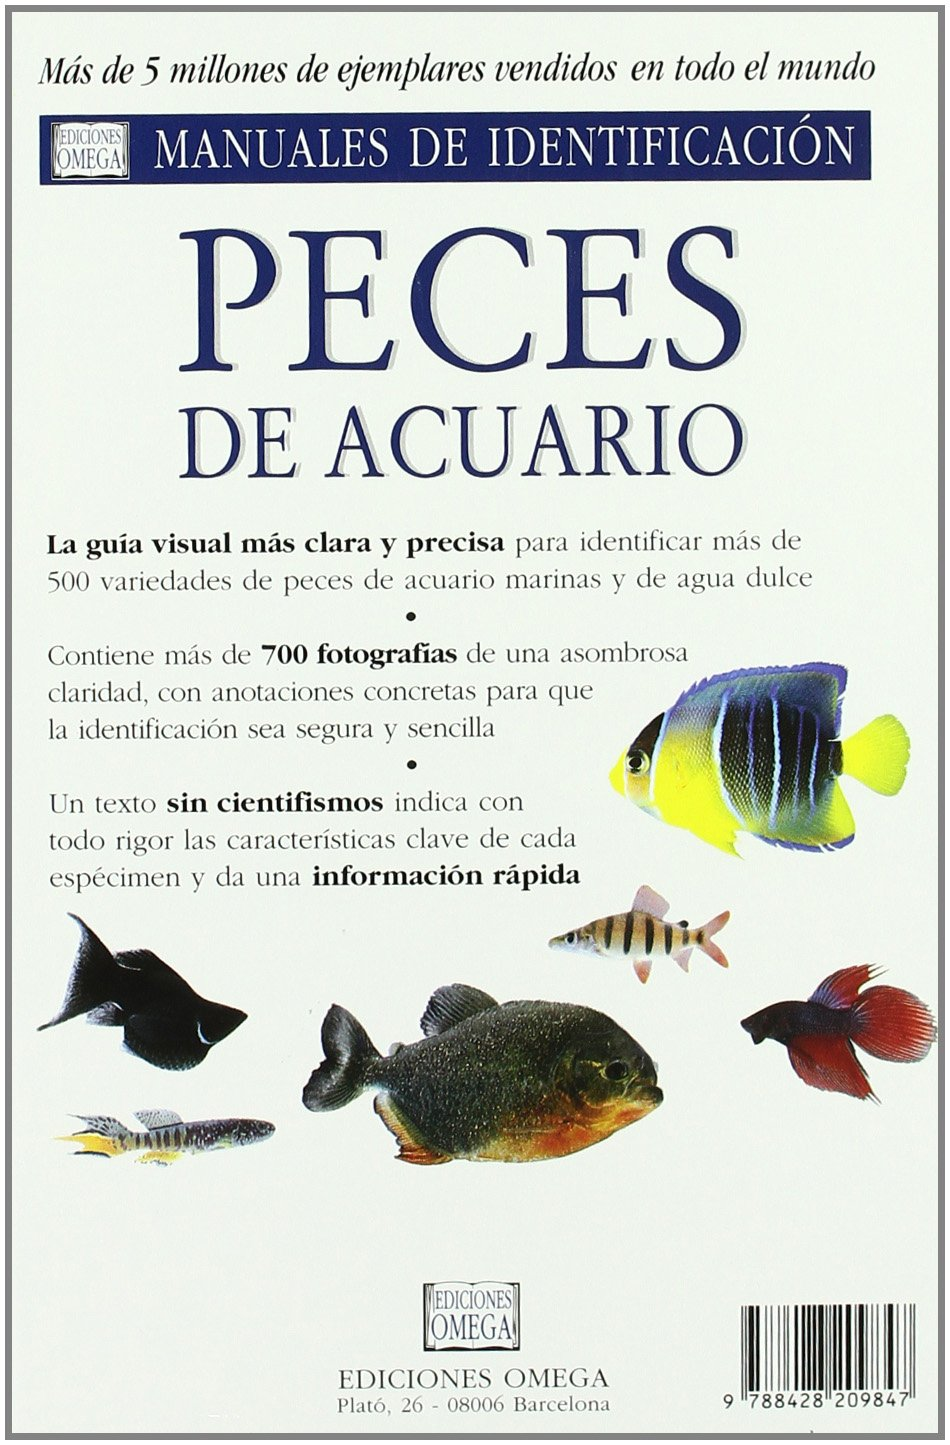 Peces de Acuario: Guia Visual de mas de 500 Variedades de Peces d e ..: D. MILLS: 9788428209847: Amazon.com: Books